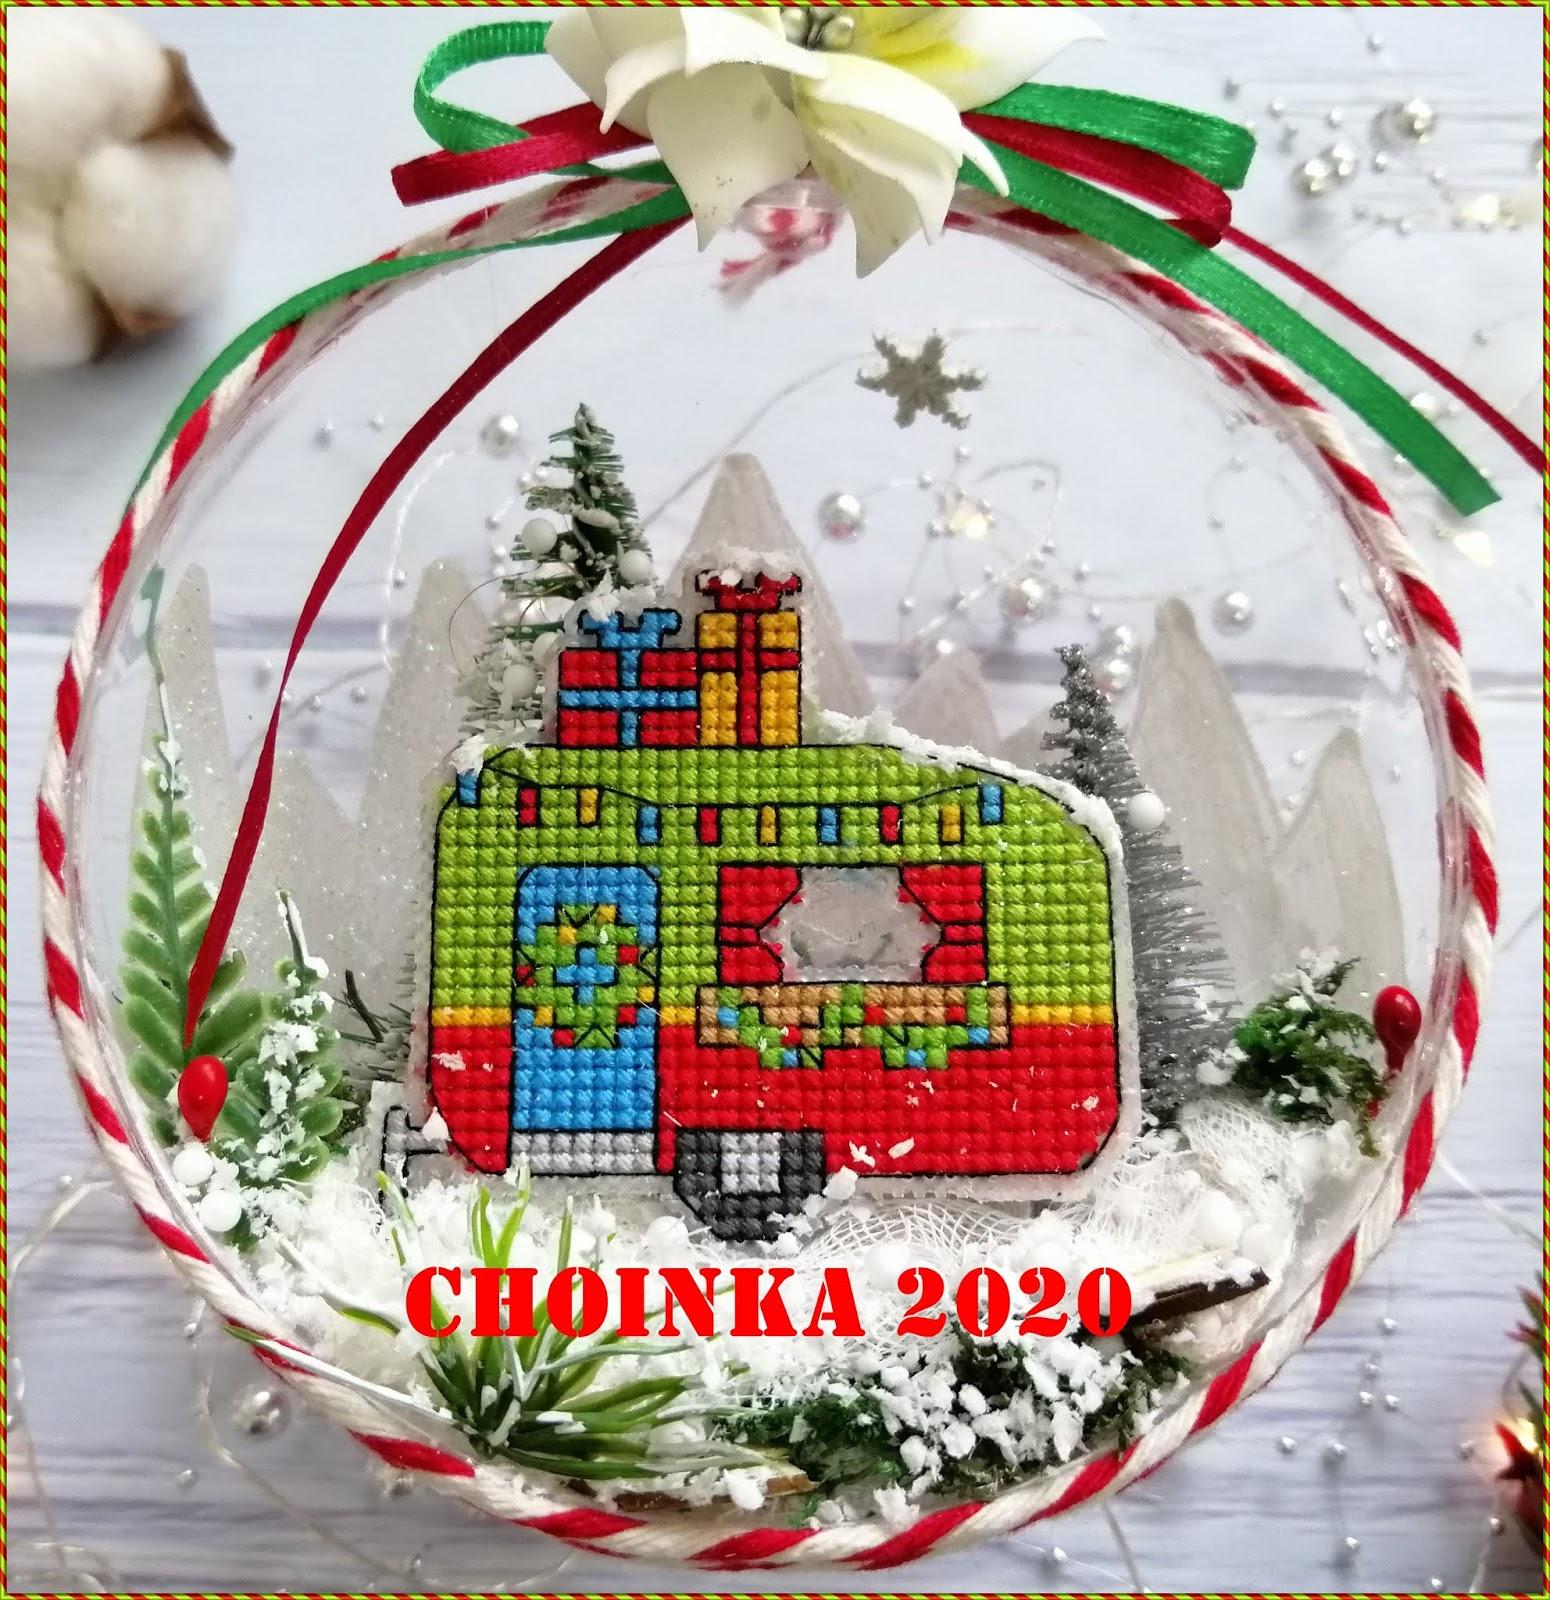 Choinka 2020